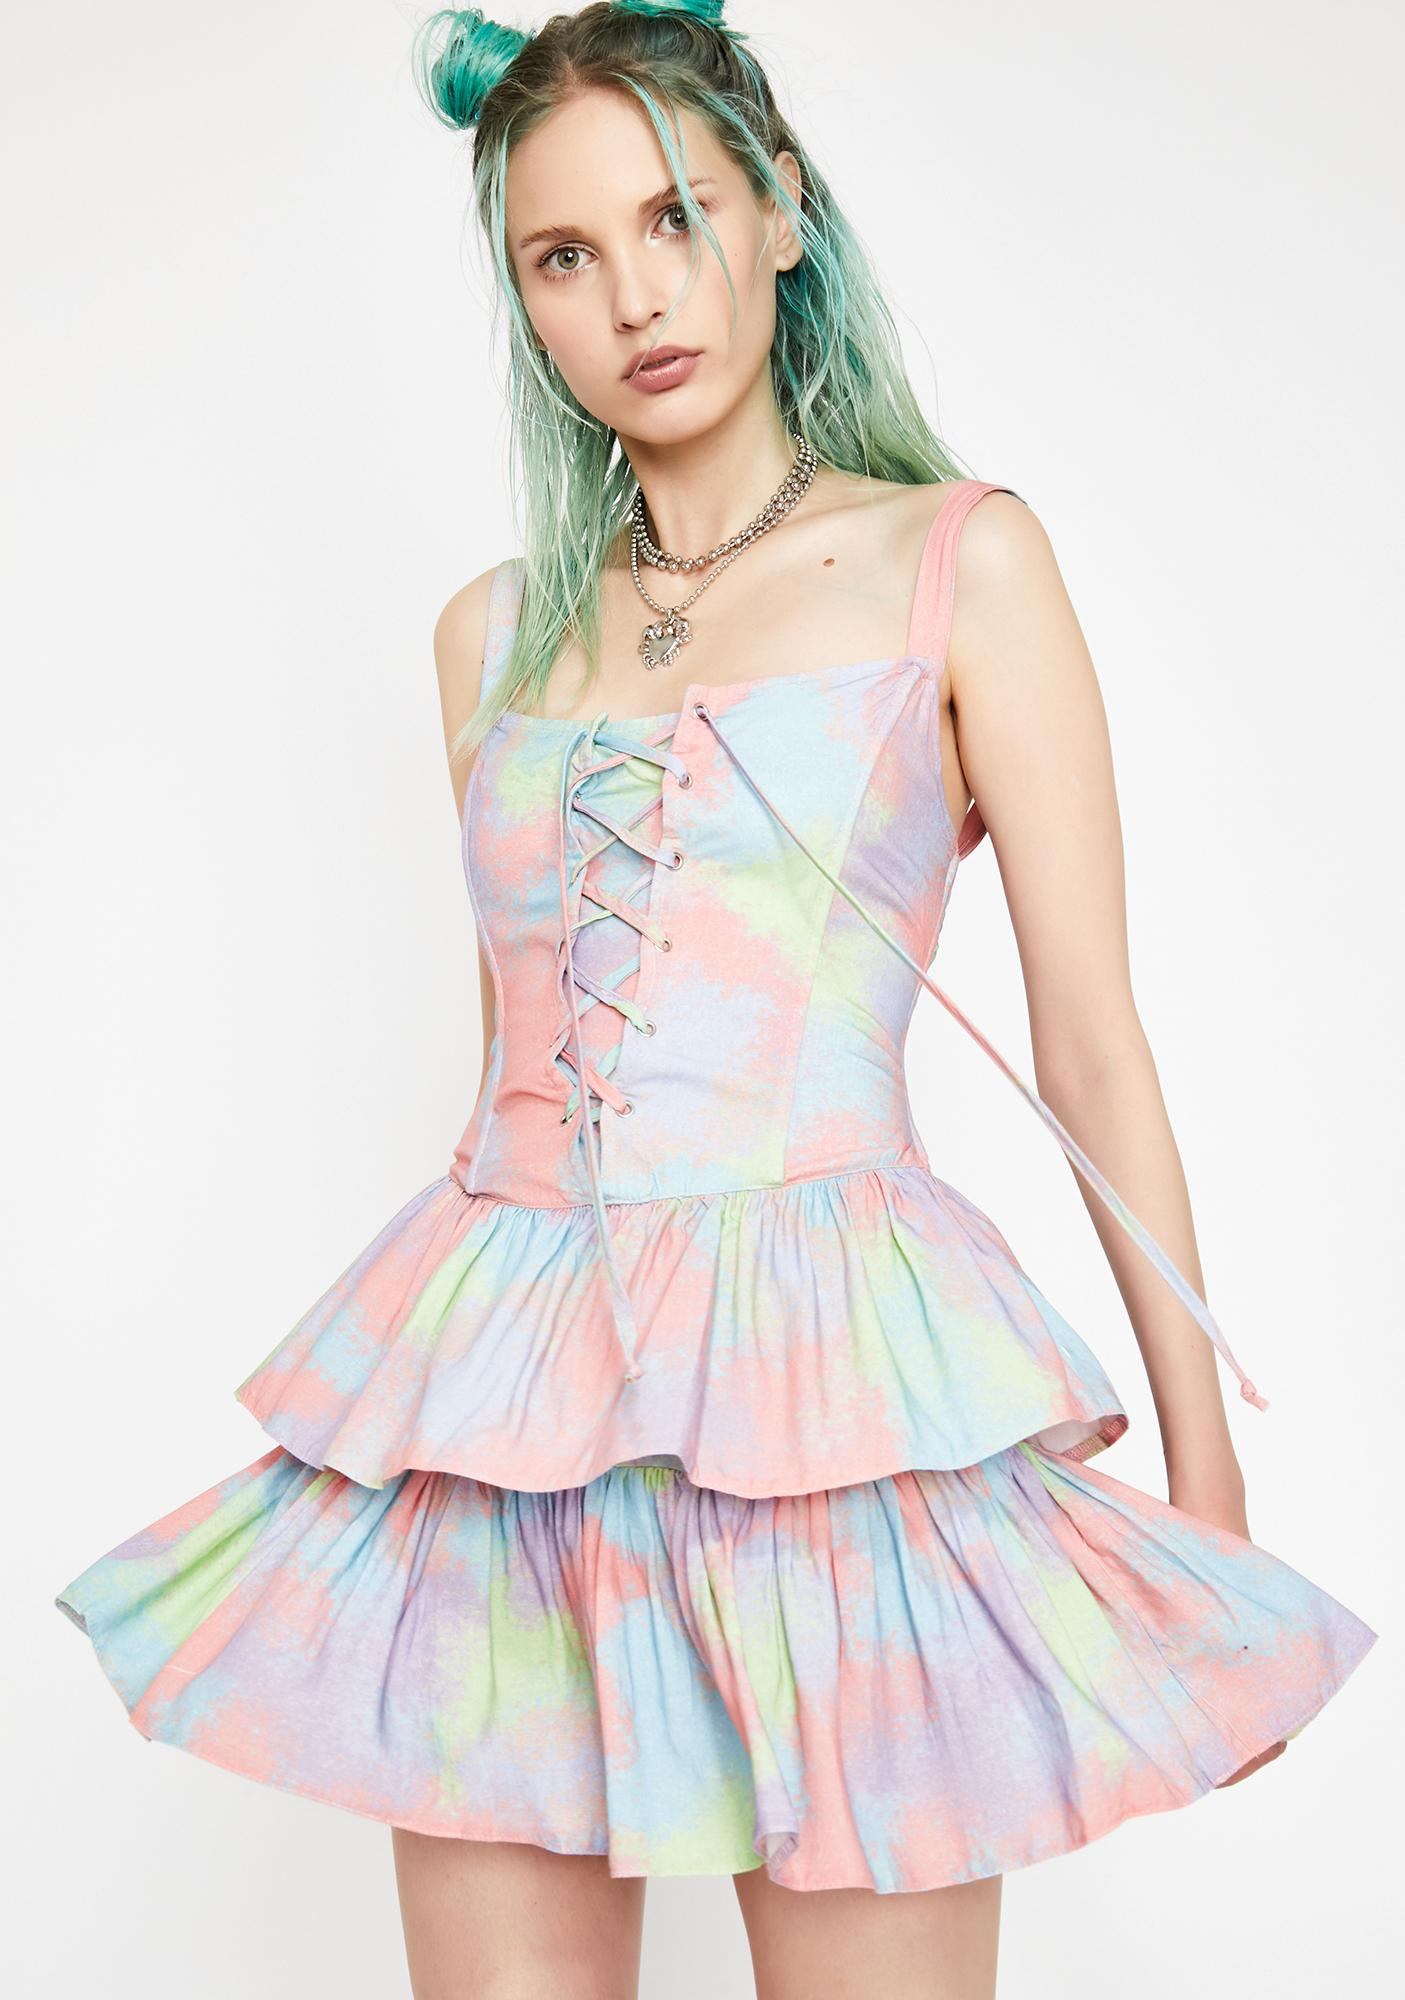 HOROSCOPEZ Moody Mystic Tie Dye Dress